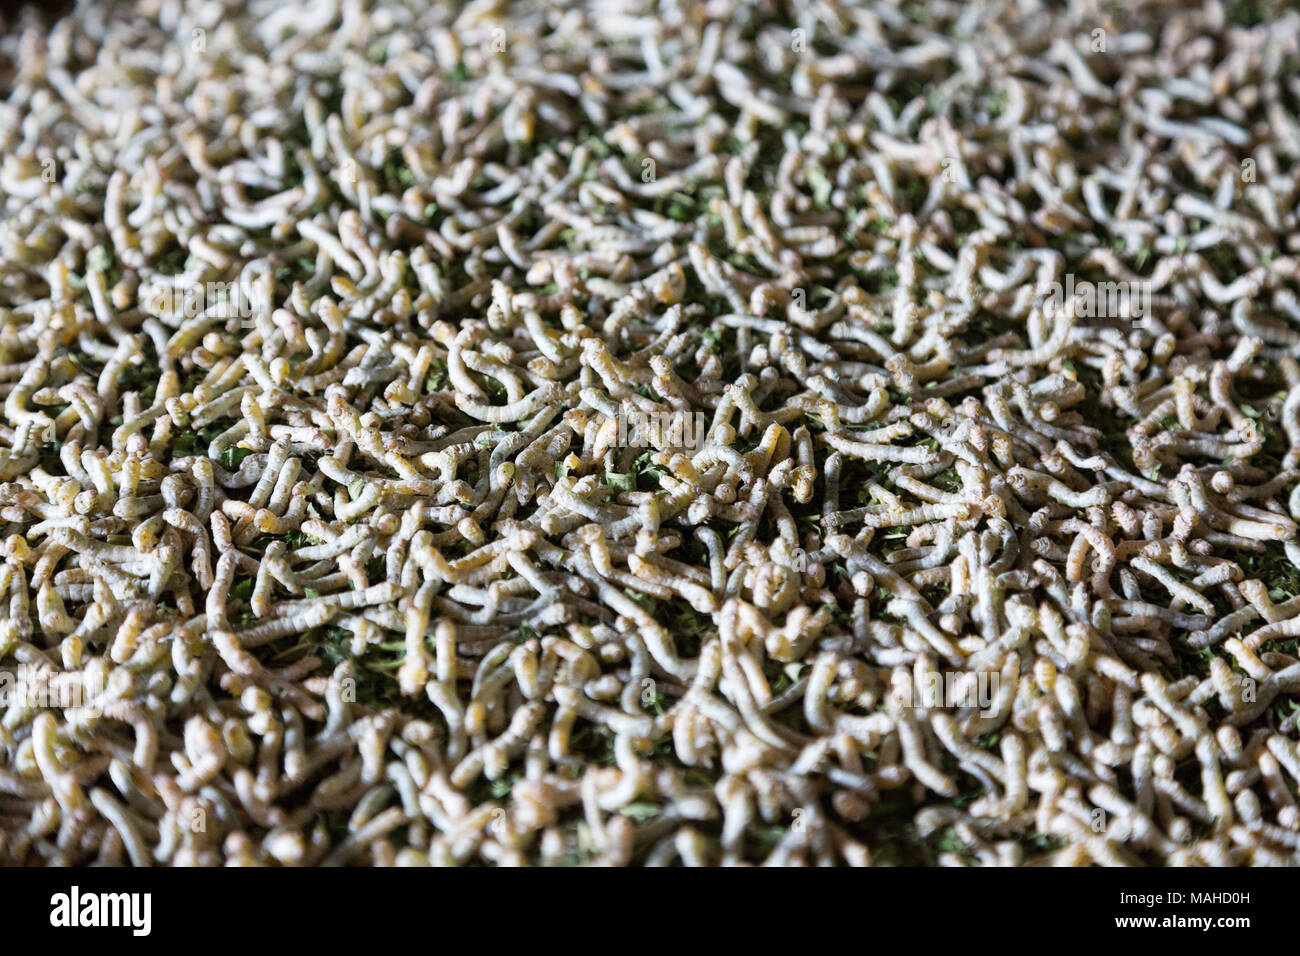 Seidenraupen - Nahaufnahme der Seidenraupen, die Larve, Raupe oder imago Der silkmoth (Bombyx mori), von der Seide ist, Kampong Thom, Cambo Stockbild